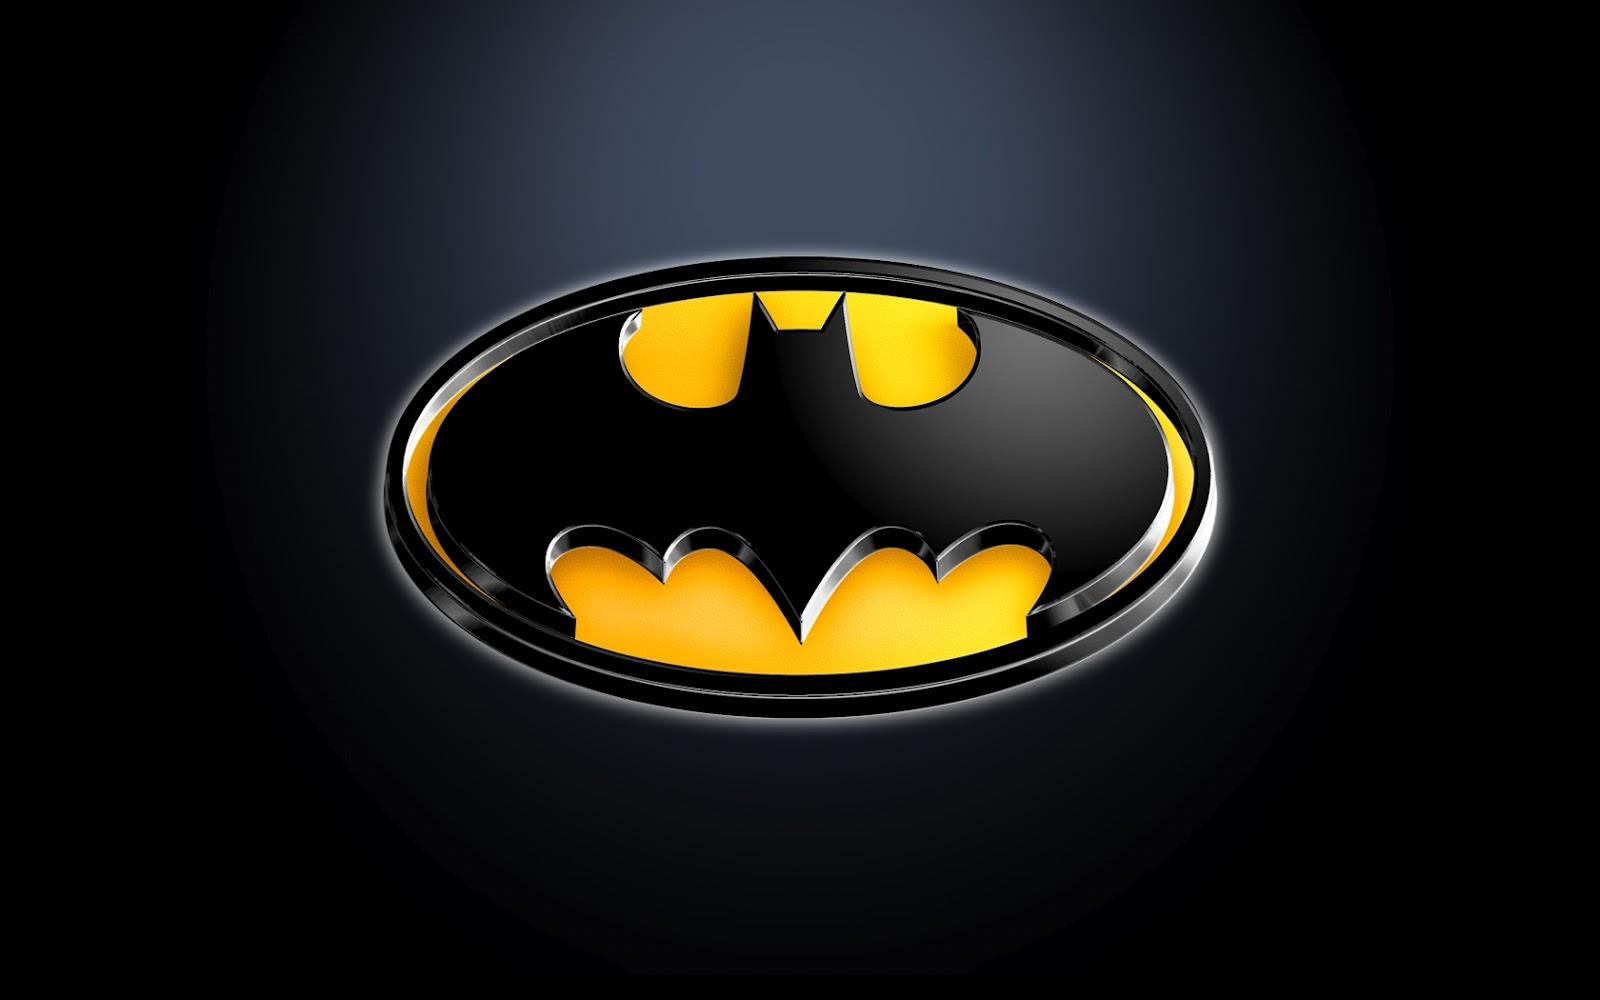 46+] Batman Logo Wallpaper HD on WallpaperSafari.